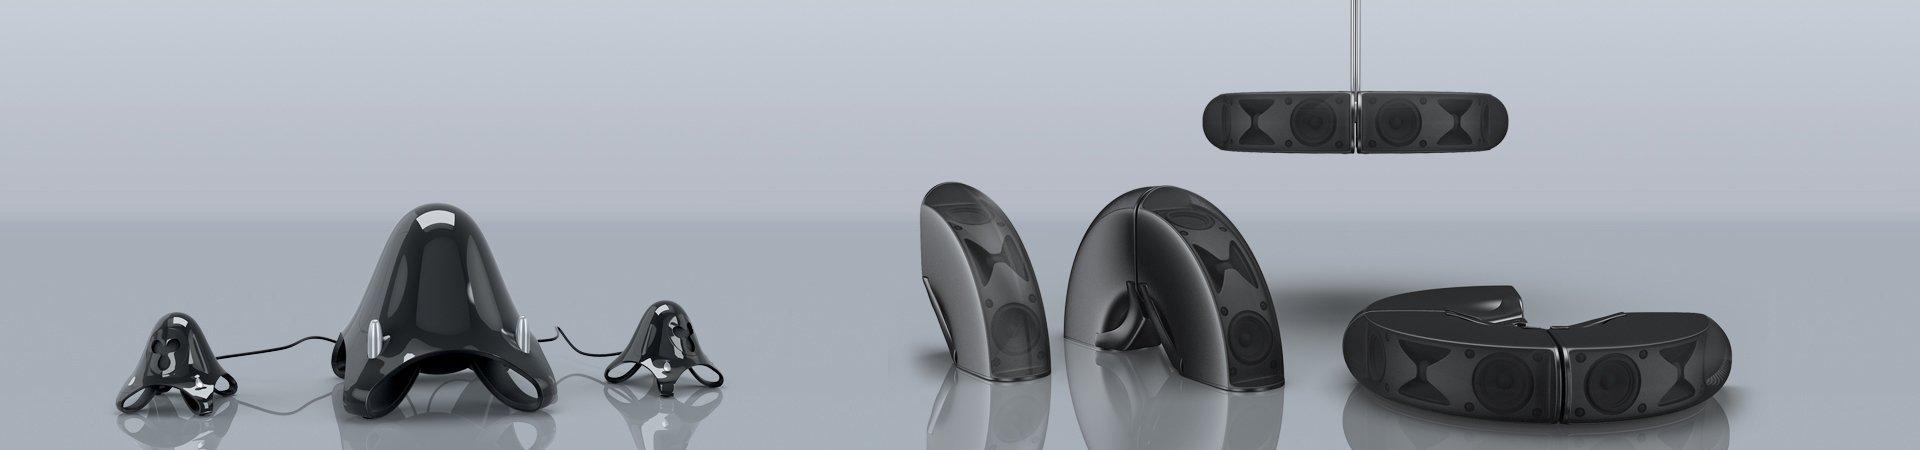 Product Industrial Design